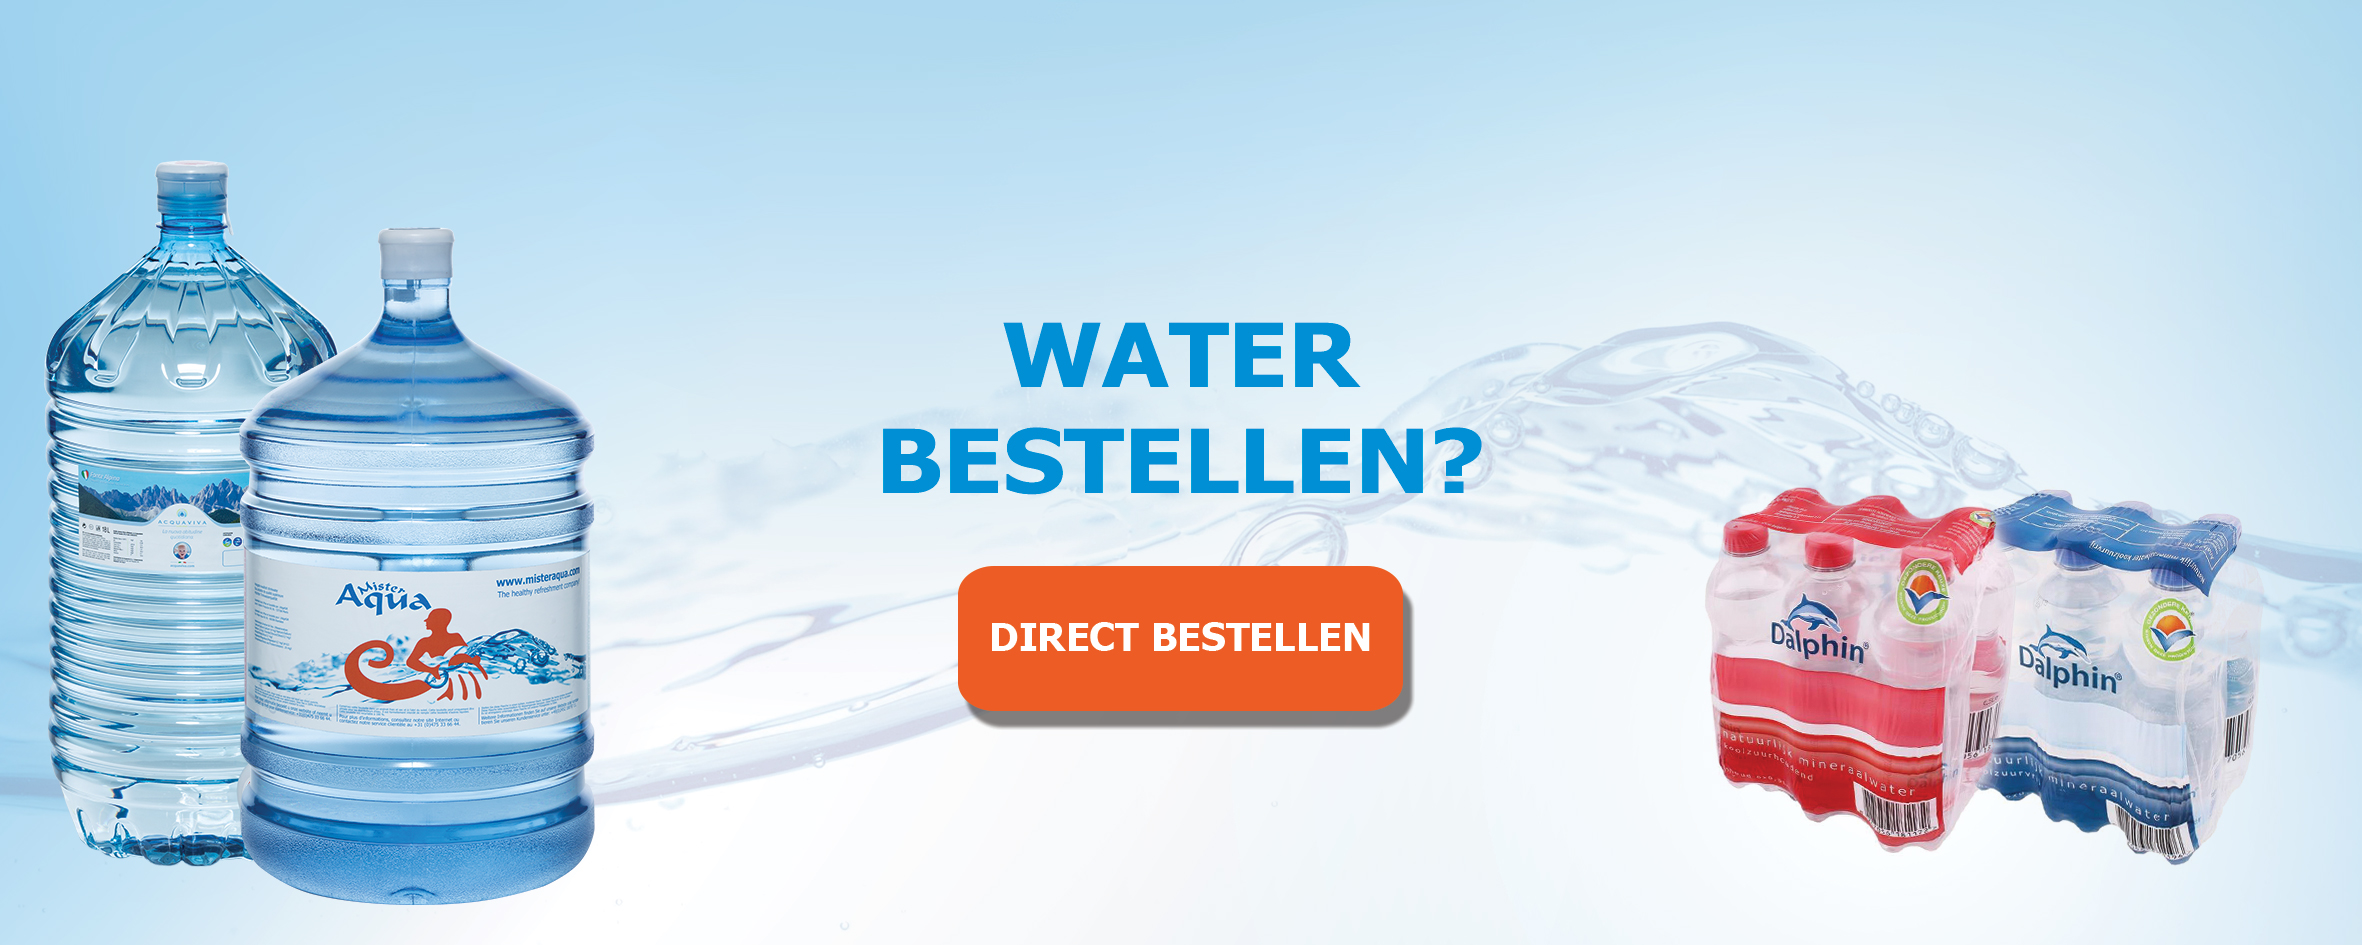 Water-bestellen